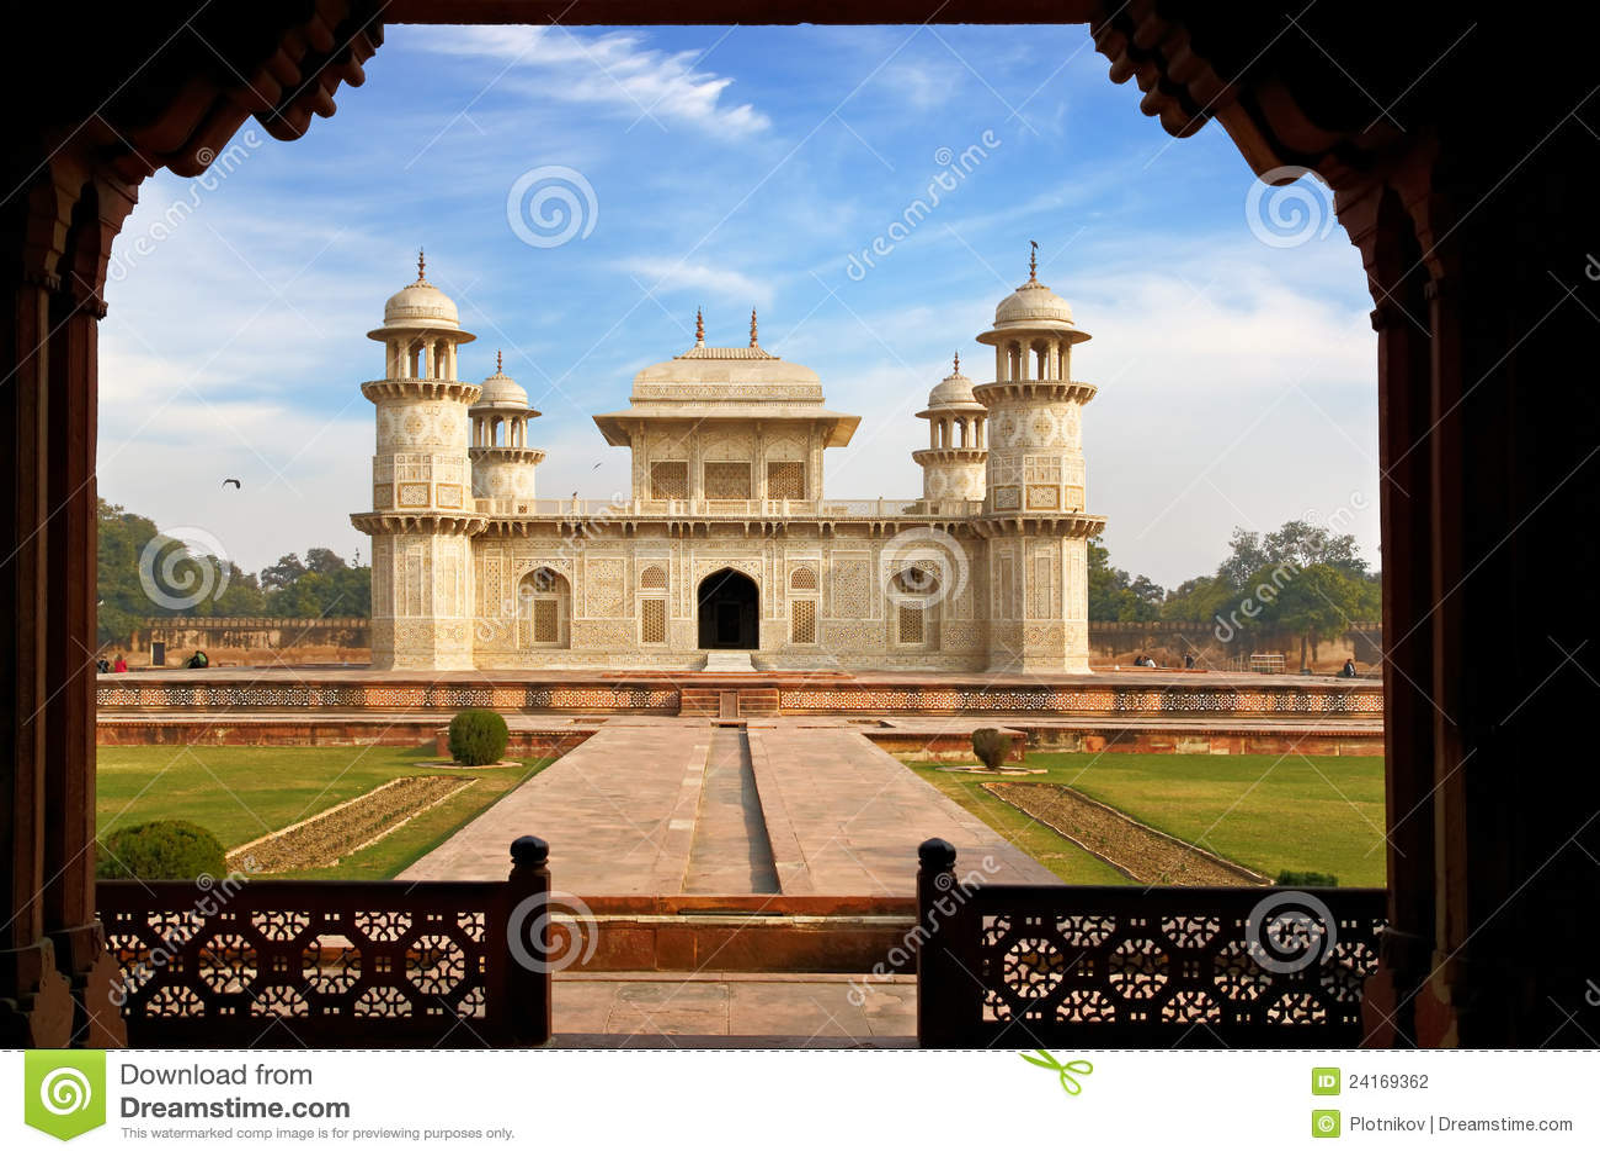 Itmad Ud Daula S Tomb Is A Mughal Mausoleum Agra Stock